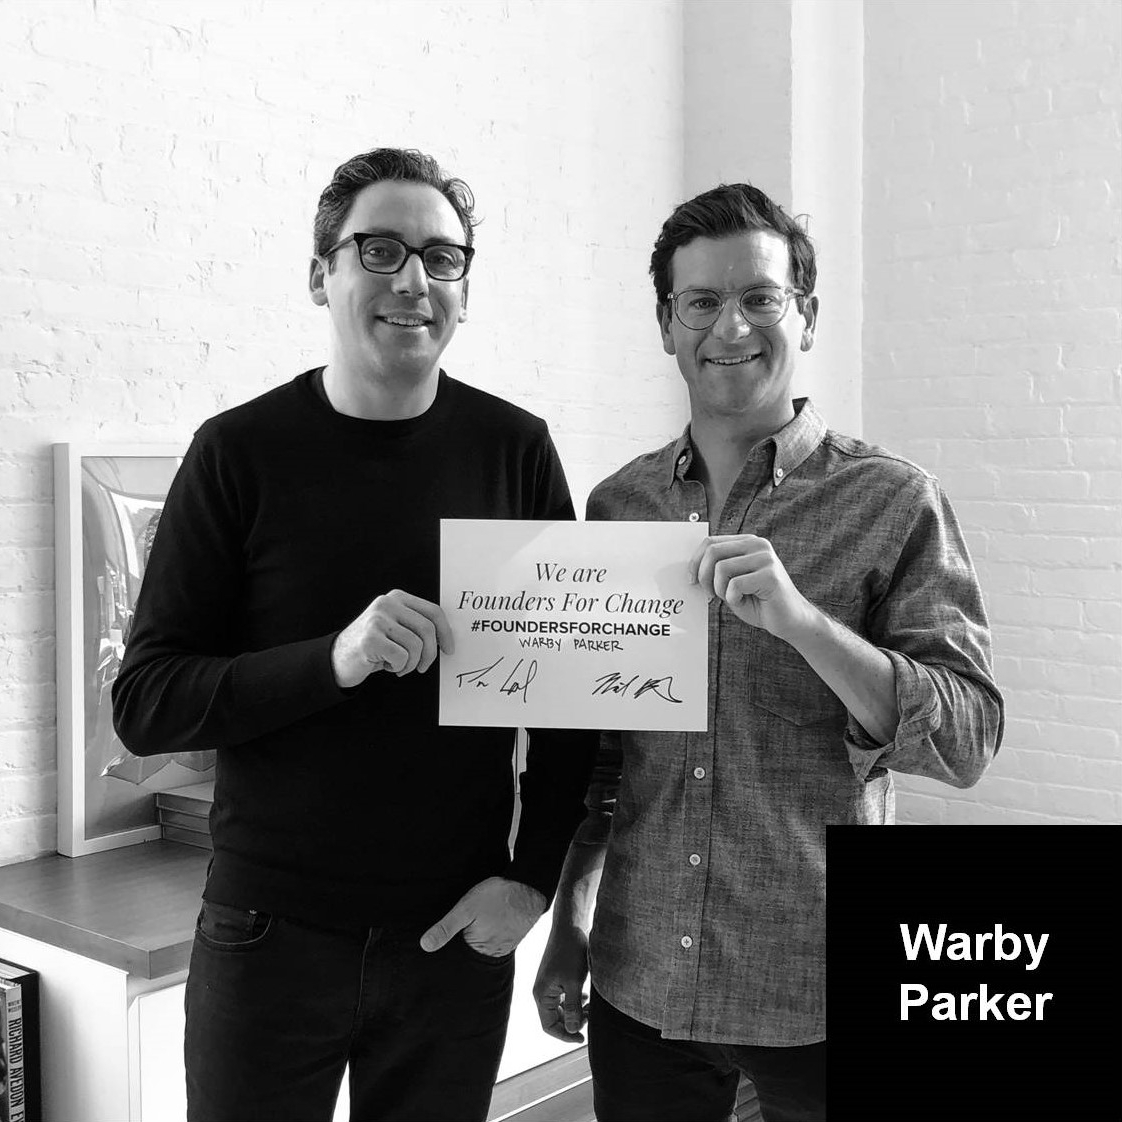 Dave Gilboa_Neil Blumenthal_Warby Parker.jpg